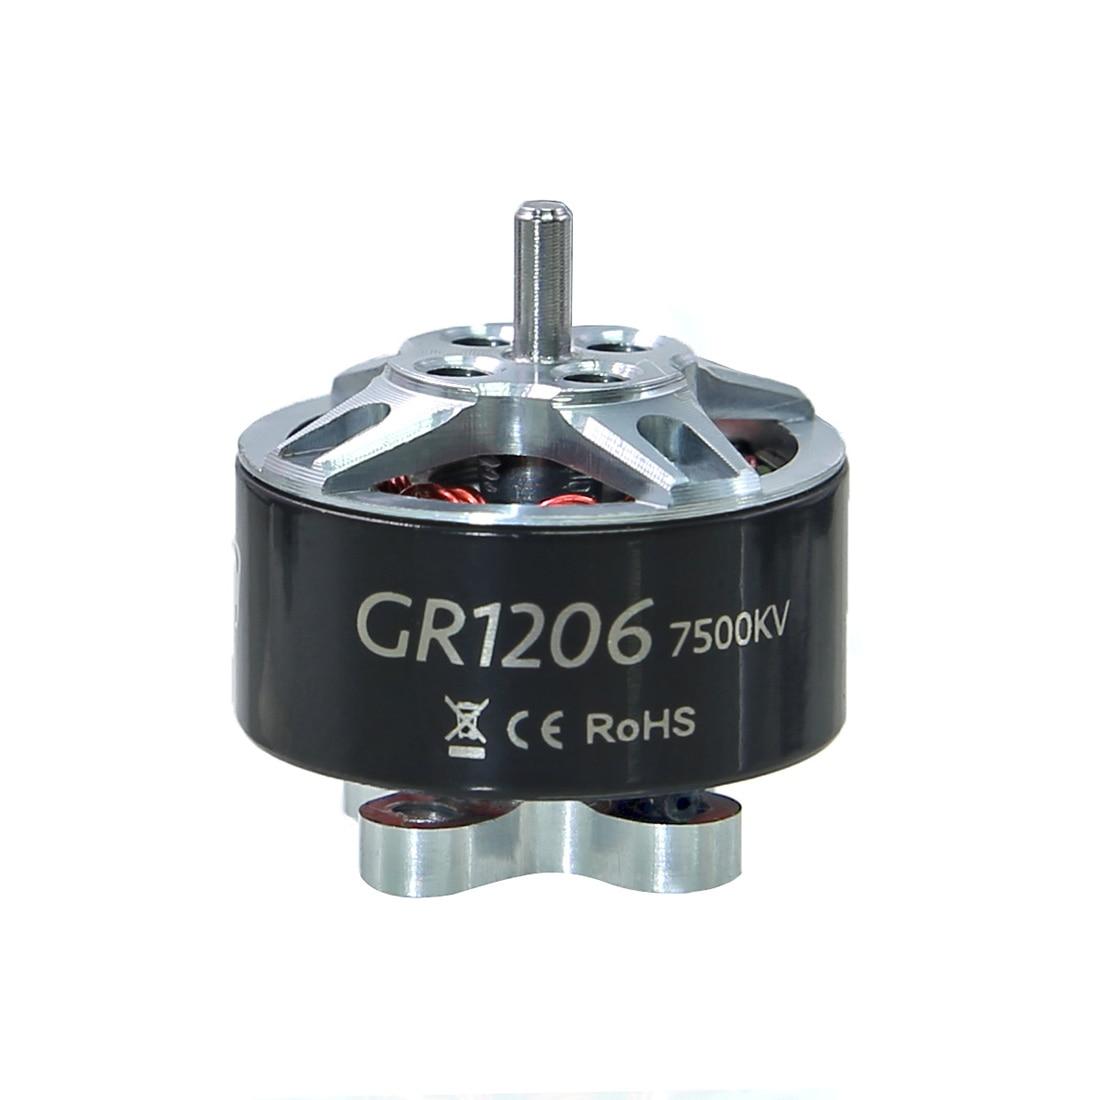 GEPRC GR1206 Motor sin escobillas 4500KV 6000KV 7500KV 2-4S motores mini para DIY FPV multicóptero Quadcopter RC Dron de carreras Accesorios